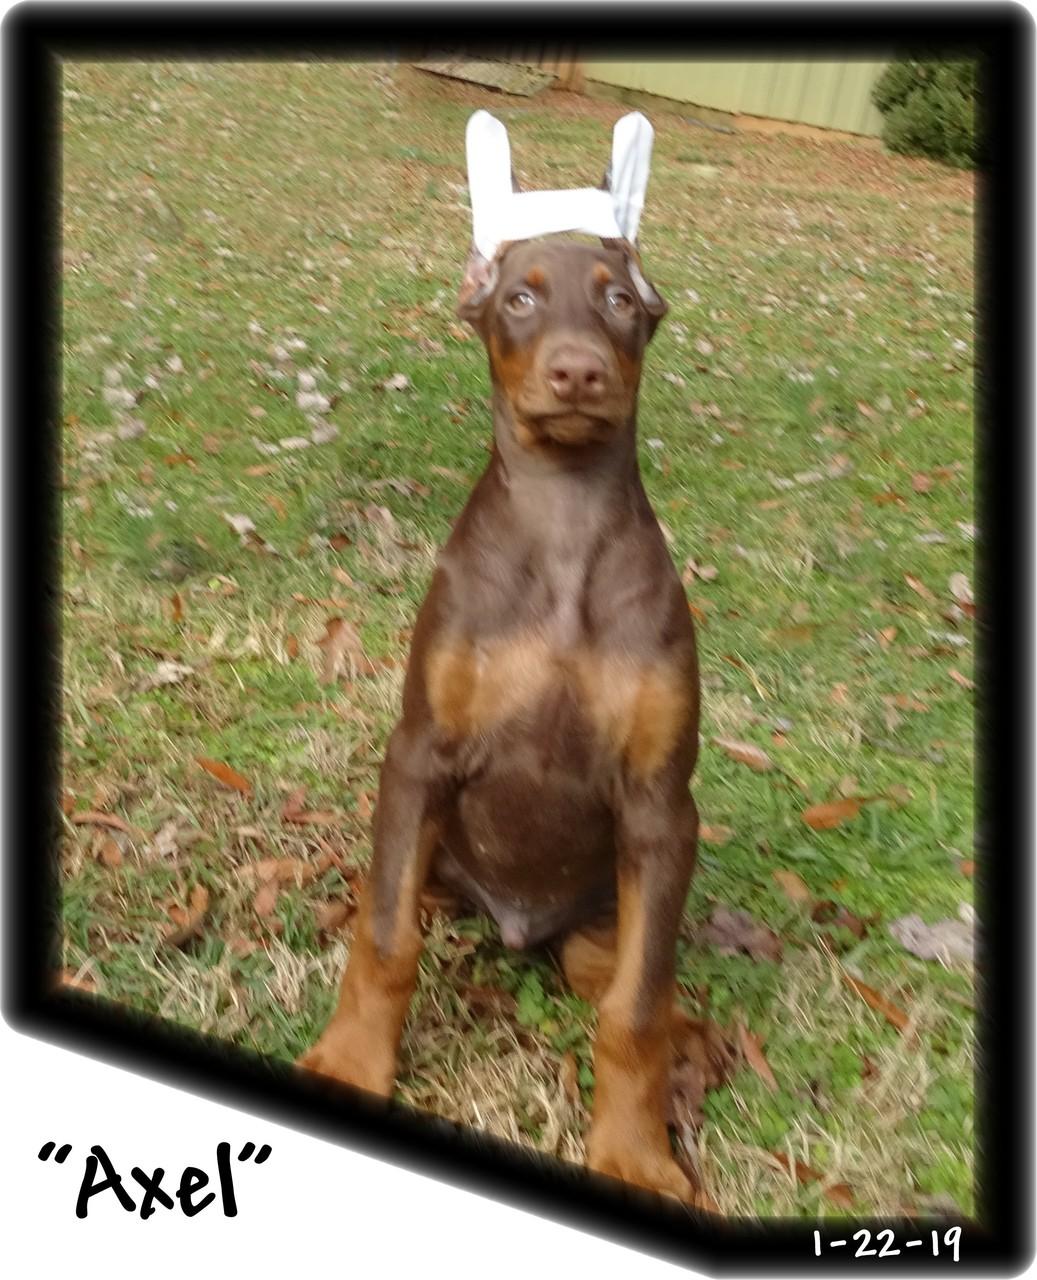 Axel...Delilah & Kodiak pup born 11-12-18